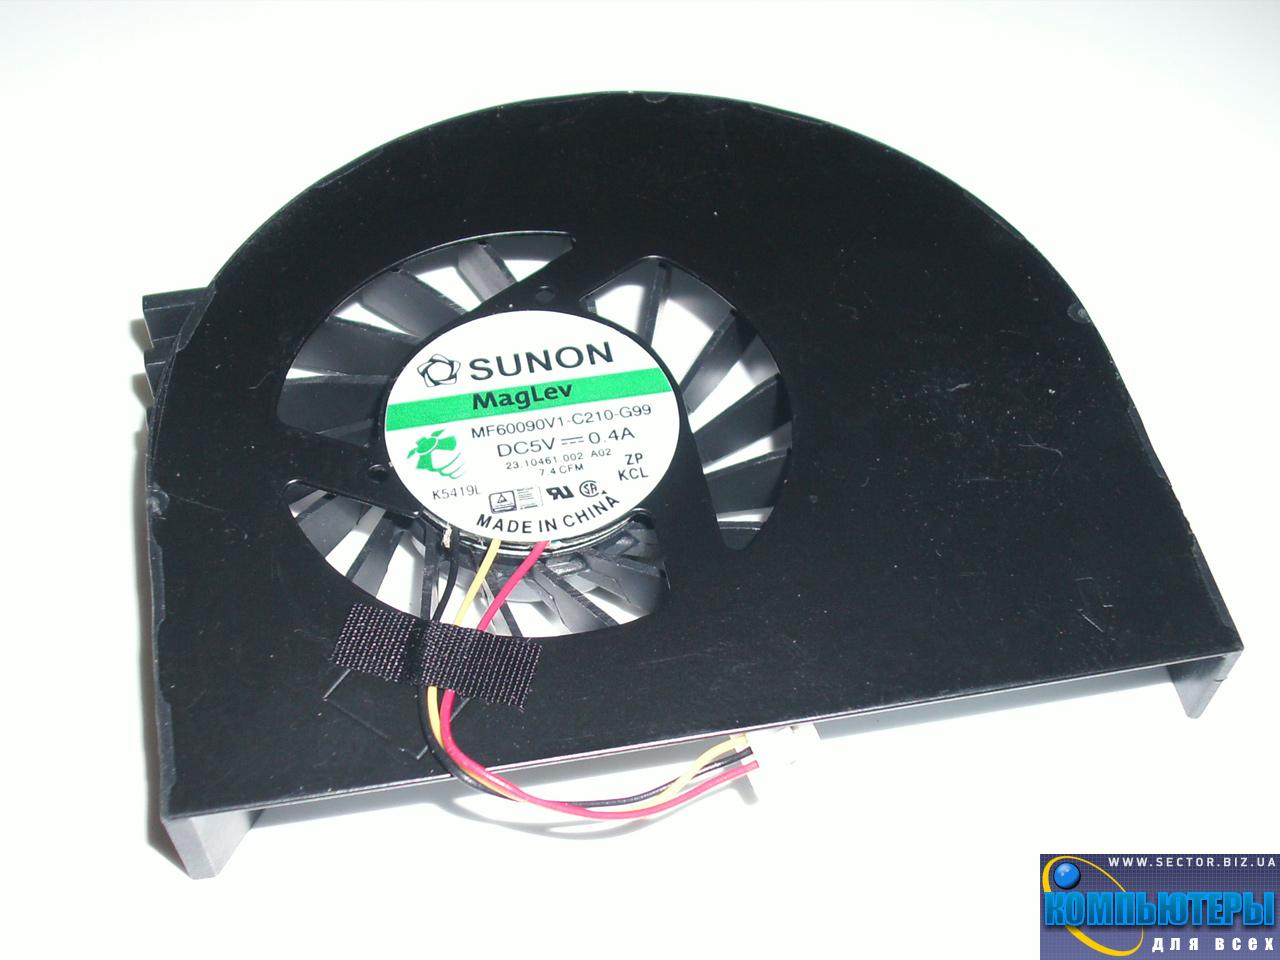 Кулер к ноутбуку Dell Inspiron 15R M5110 N5110 p/n: MF60090V1-C210-G99. Фото № 3.